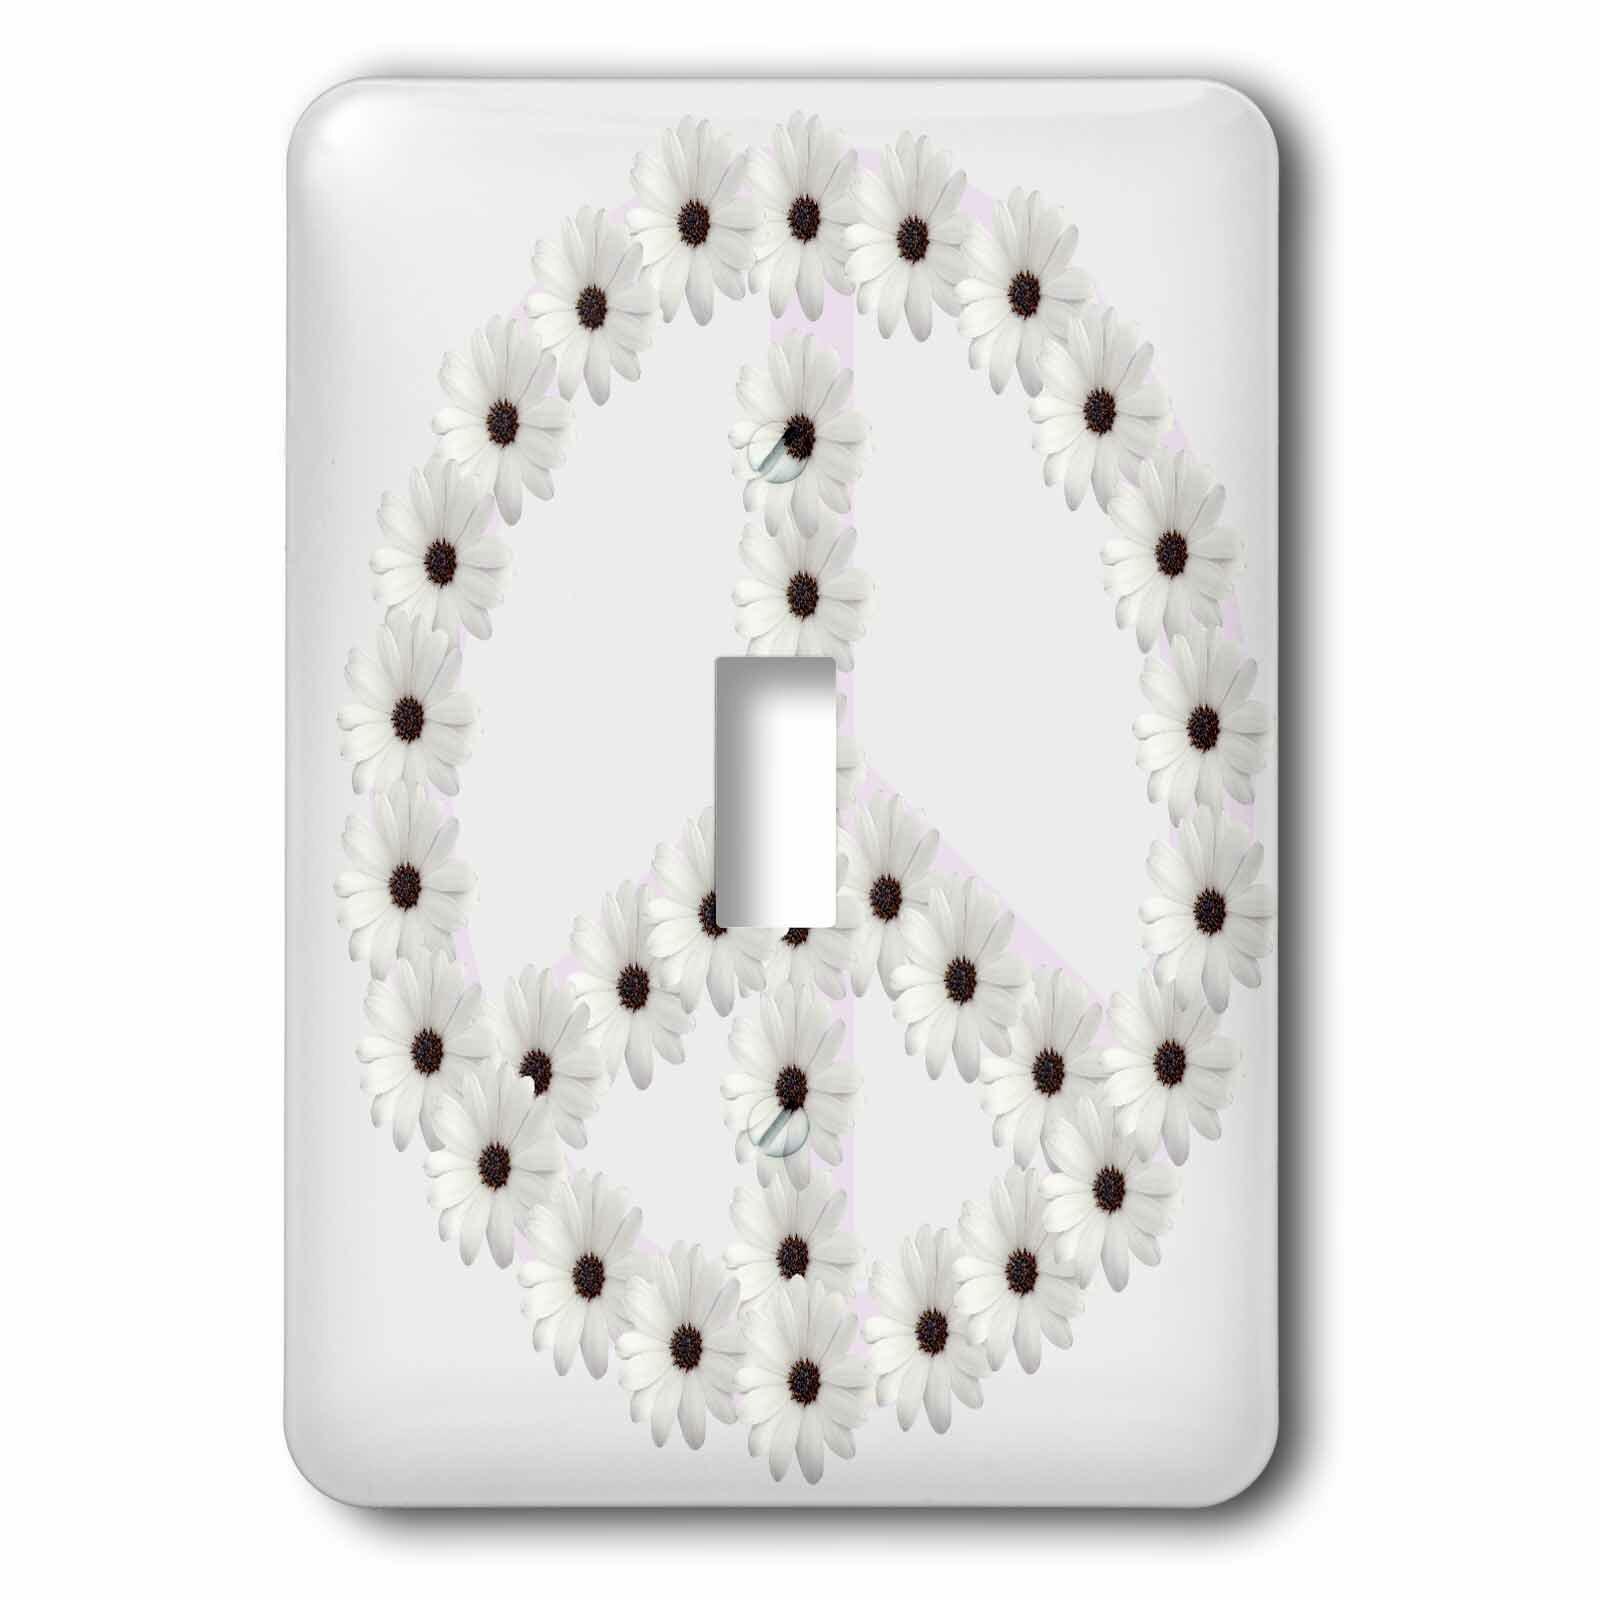 3drose Flower Peace Sign 1 Gang Toggle Light Switch Wall Plate Wayfair